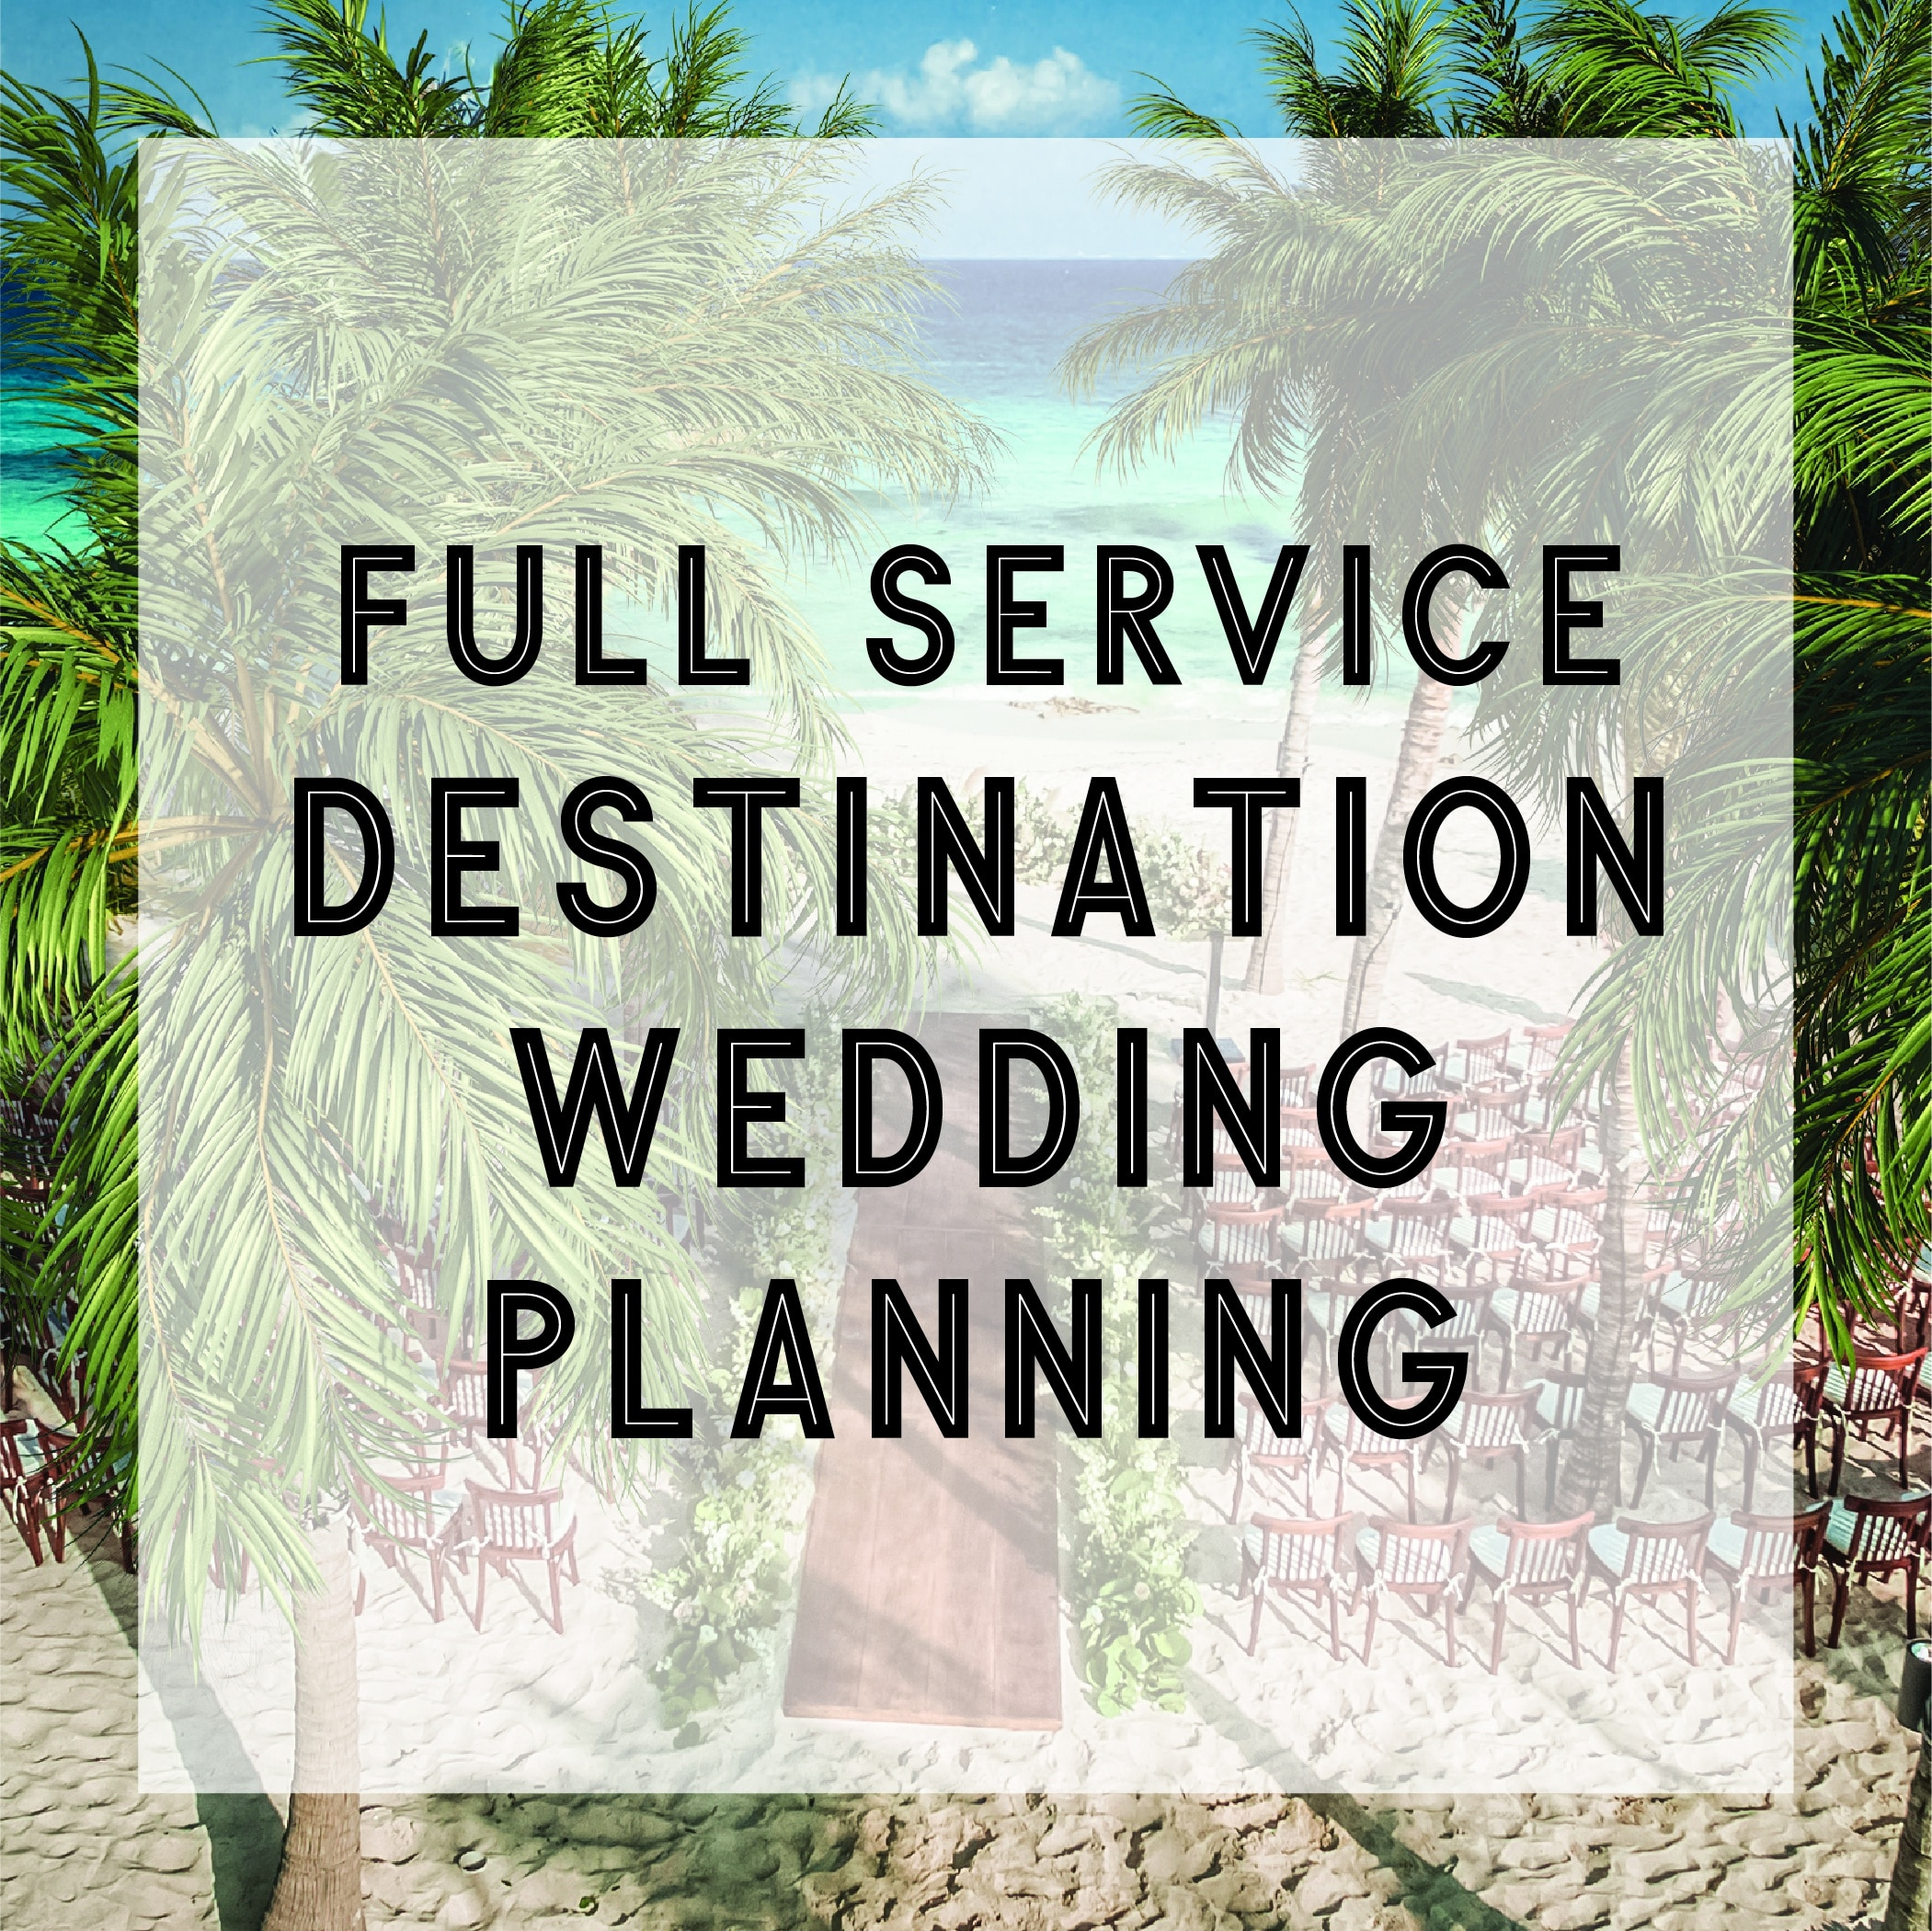 Full Service Destination Wedding Planning